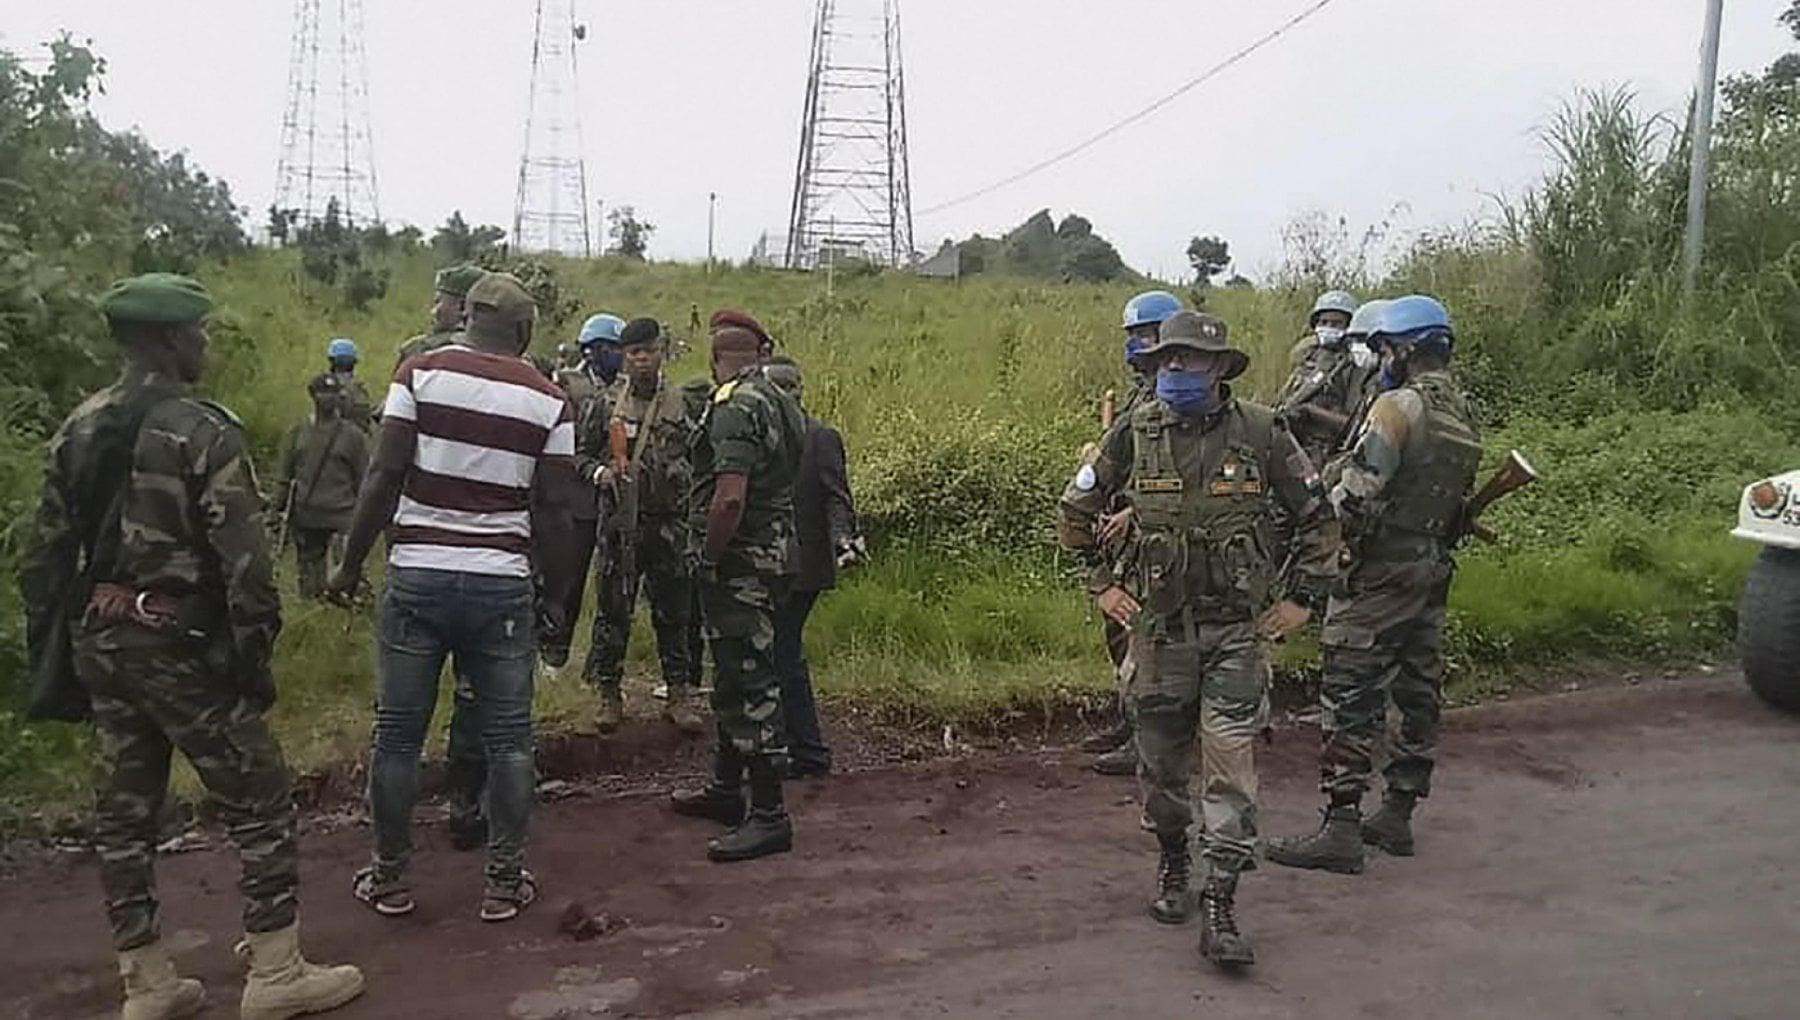 170146017 d8d963b5 6884 48a6 b852 3986661cffb2 - Congo, il carabiniere provò a salvare l'ambasciatore Attanasio